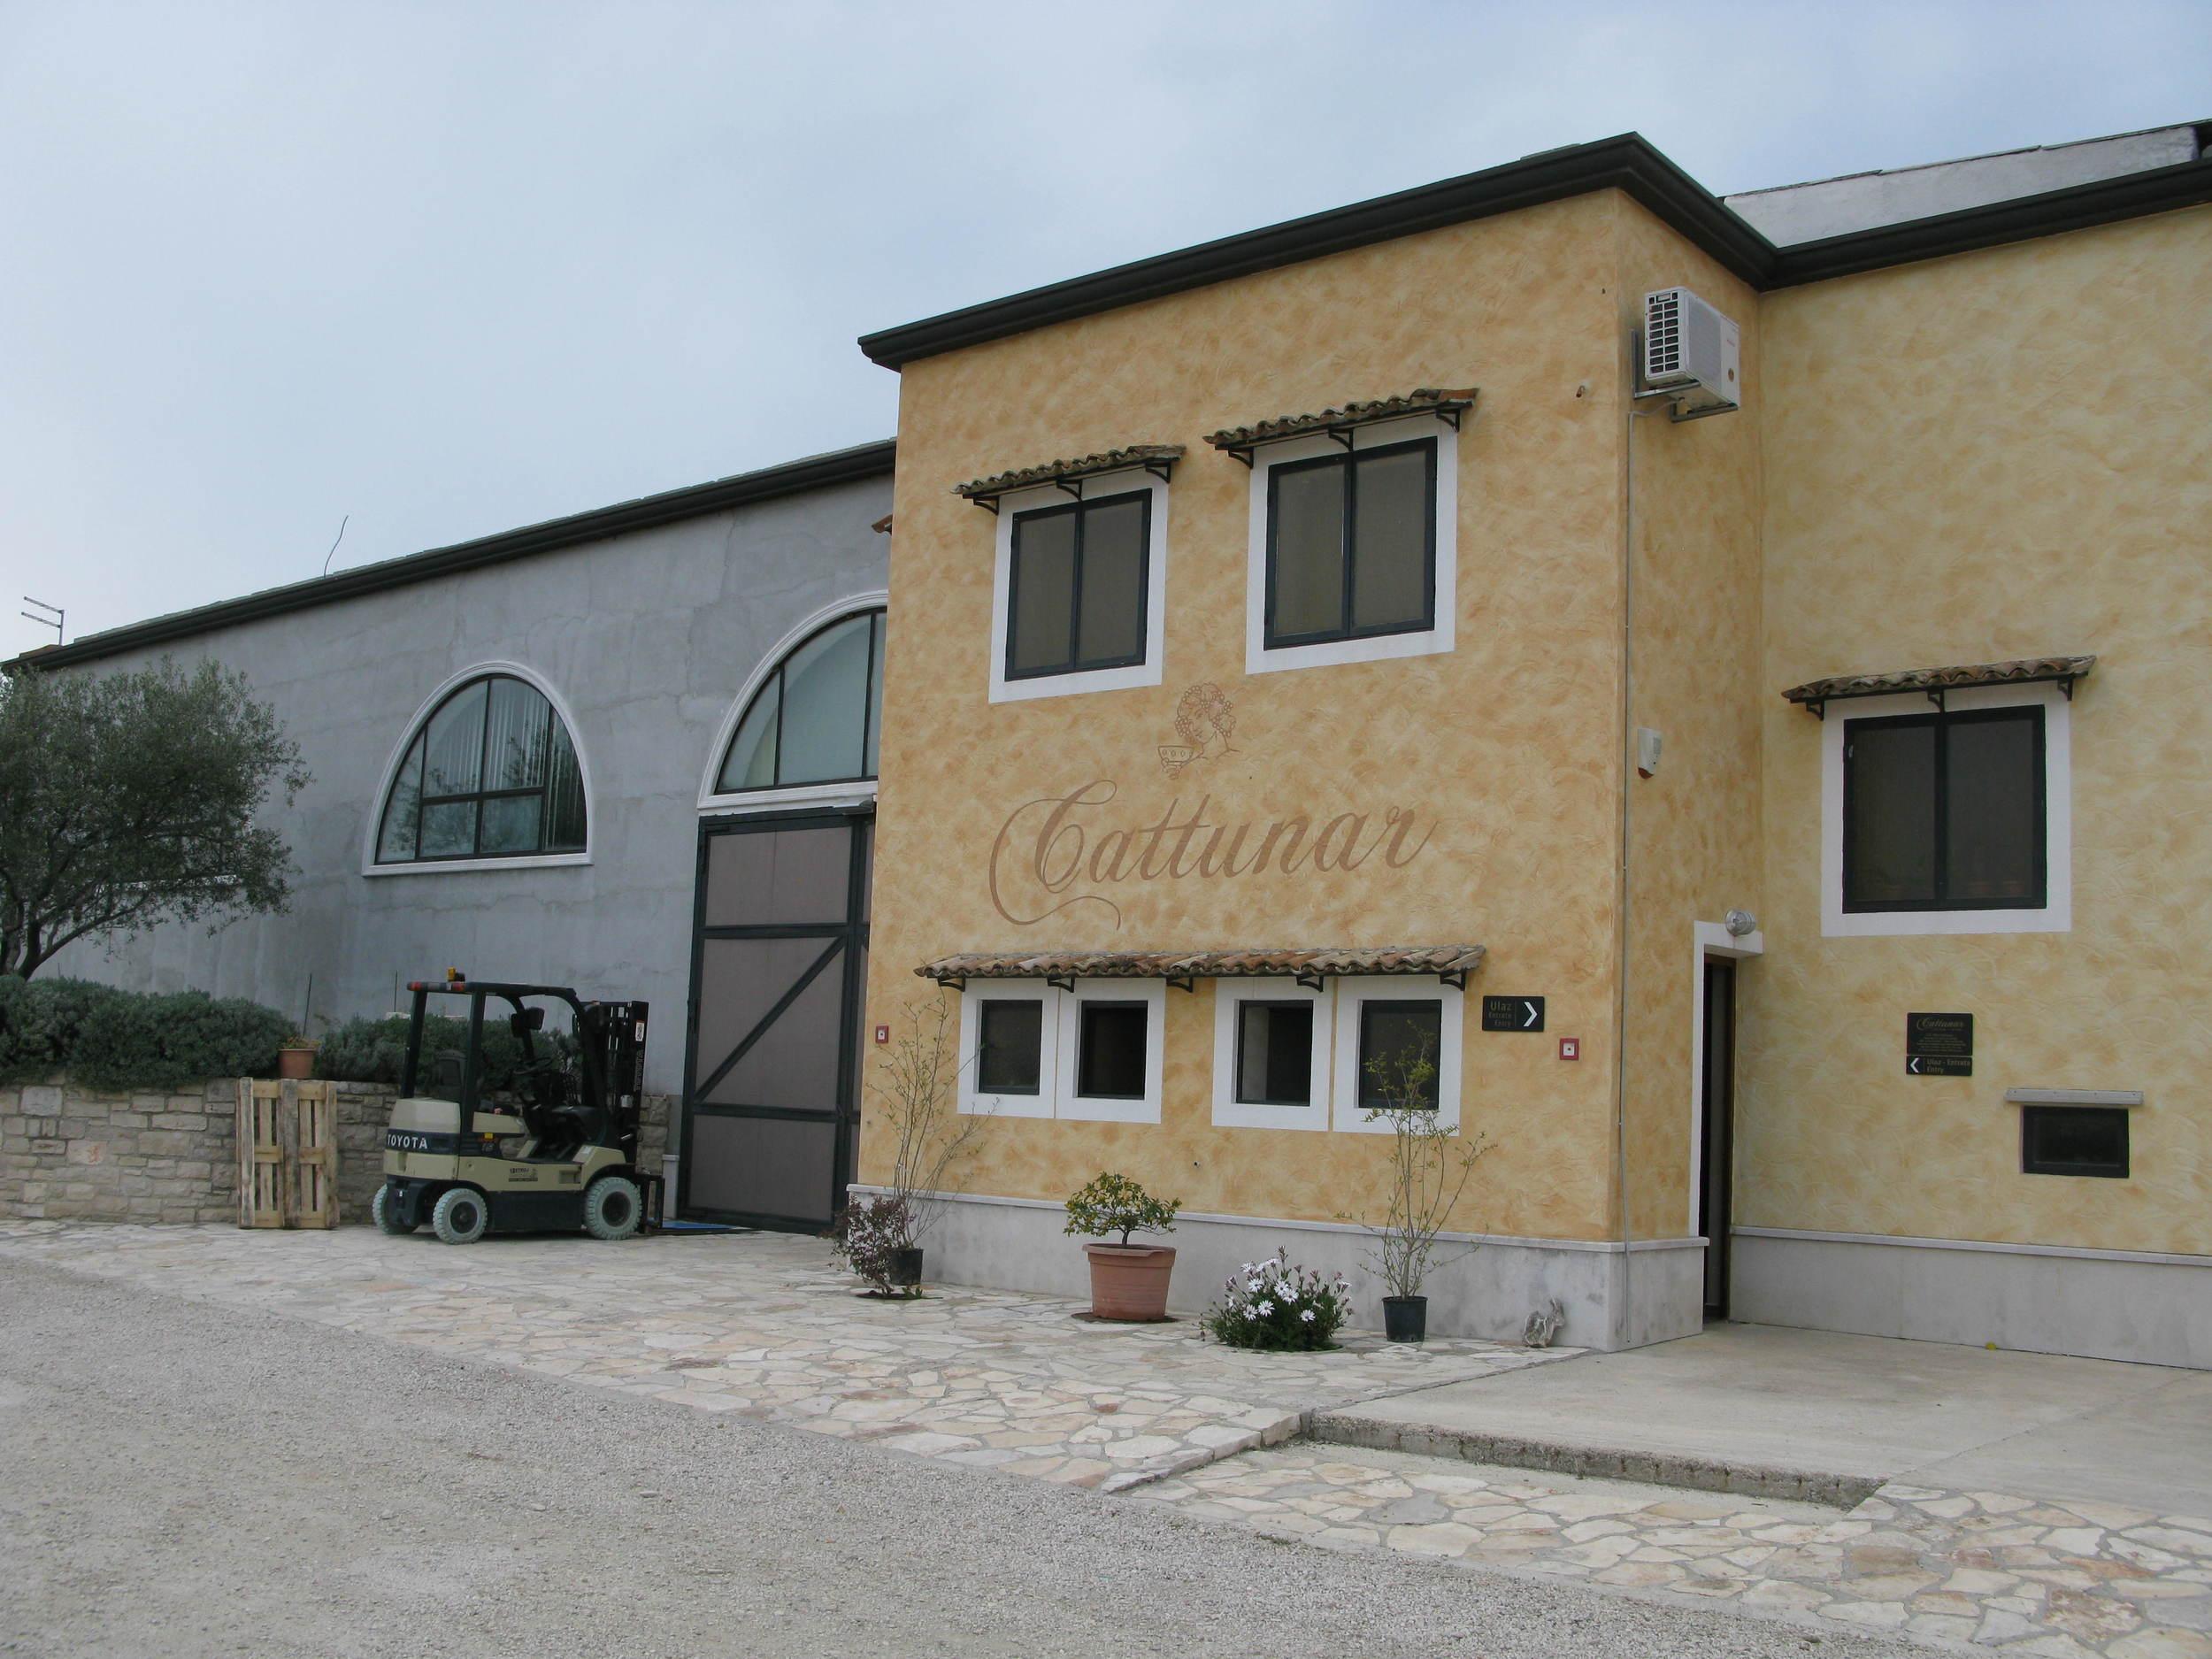 The Cattunar winery